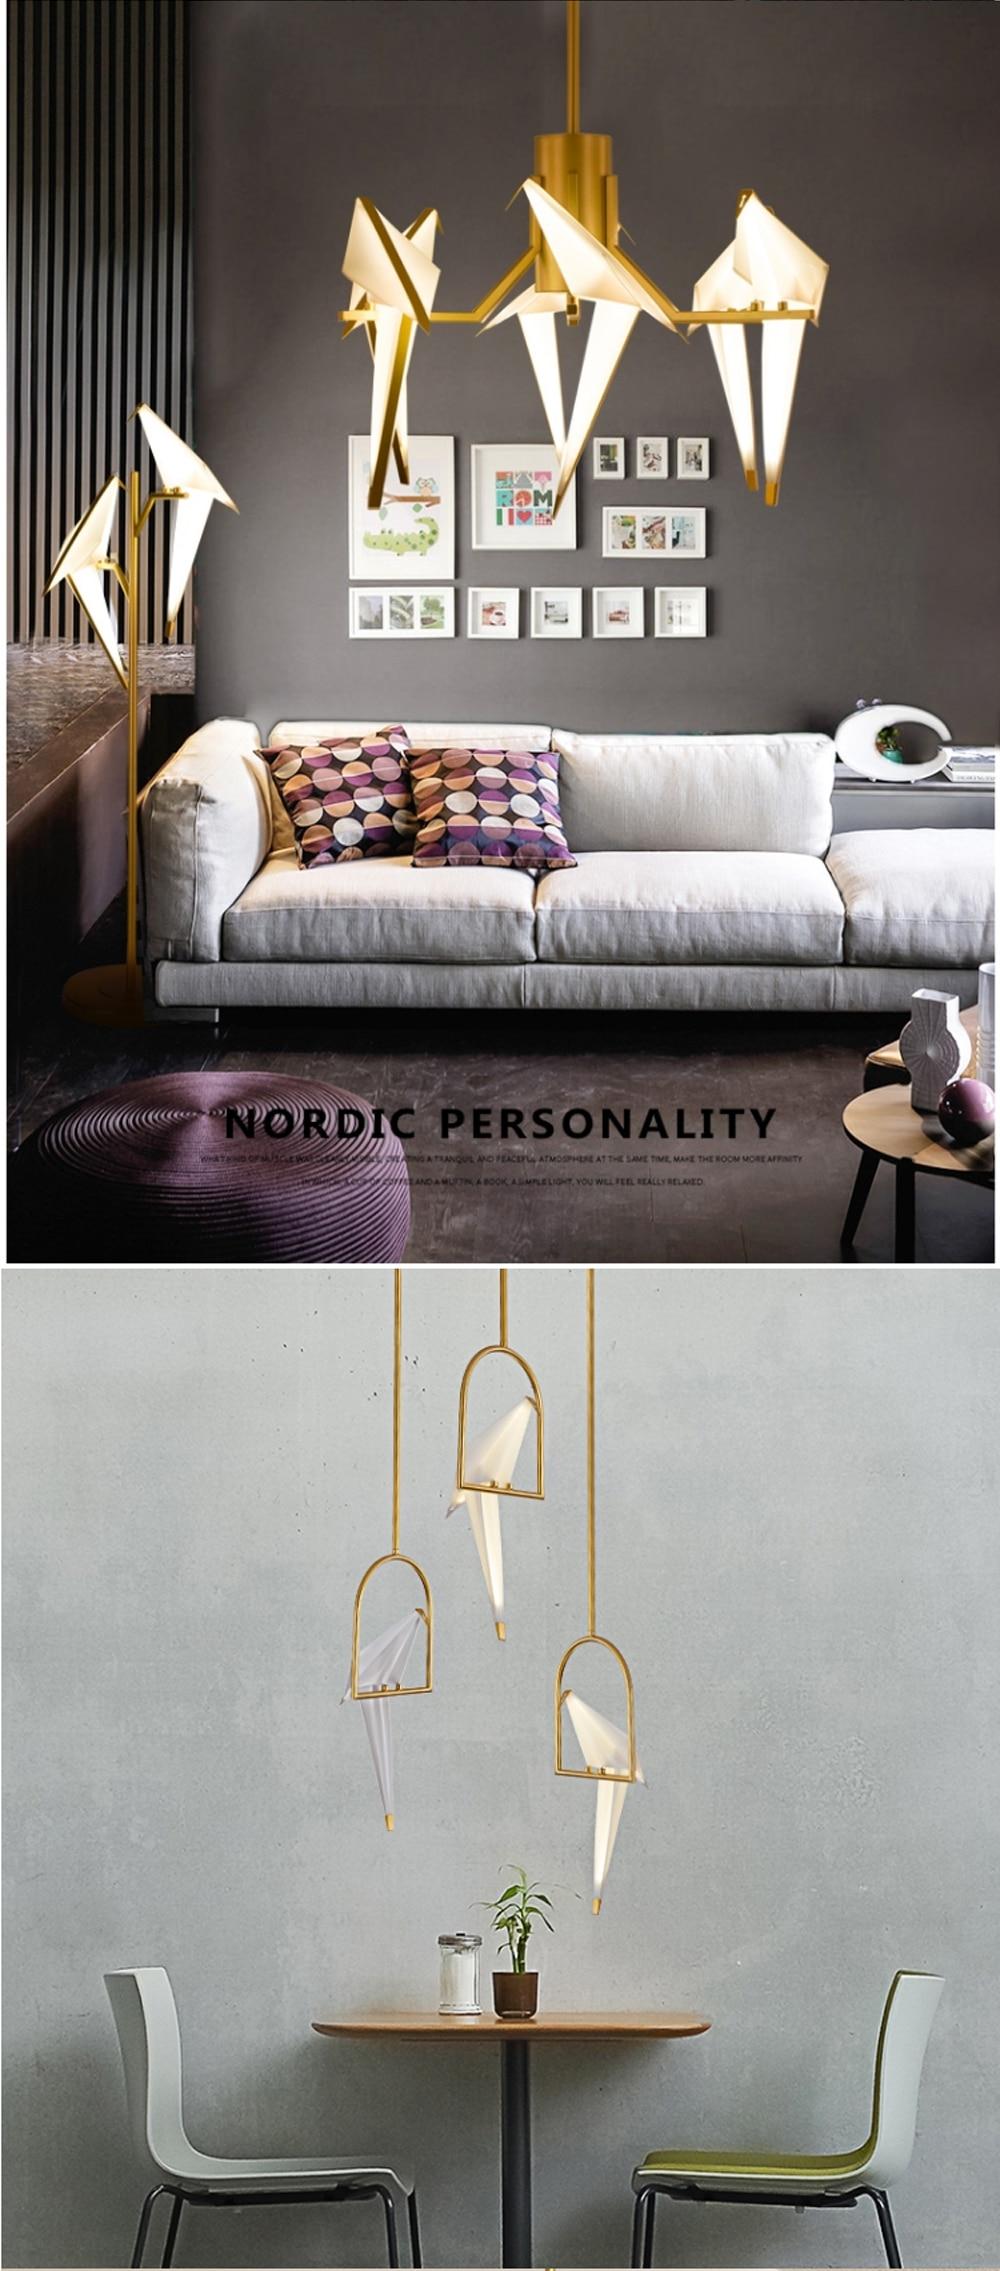 Ha9a6de4d9a6b4d689e1e4269f26bdba0s - LED Postmodern Iron Acryl Love Bird LED Lamp LED Light Wall lamp Wall Light Wall Sconce For Bedroom Corridor